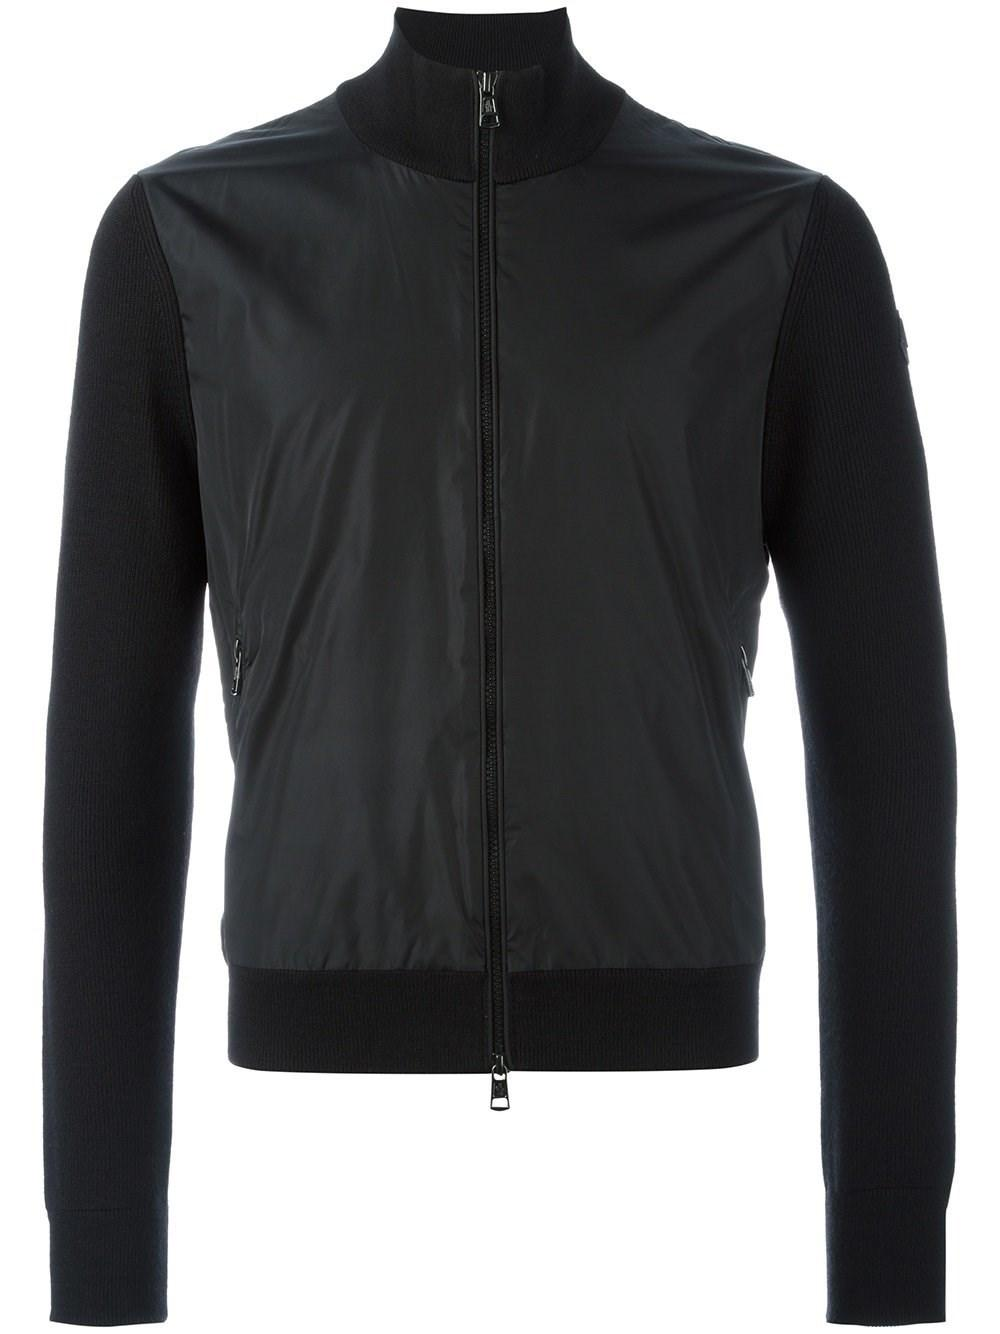 6788d093b Lyst - Moncler Knitted Sleeve Jacket in Black for Men